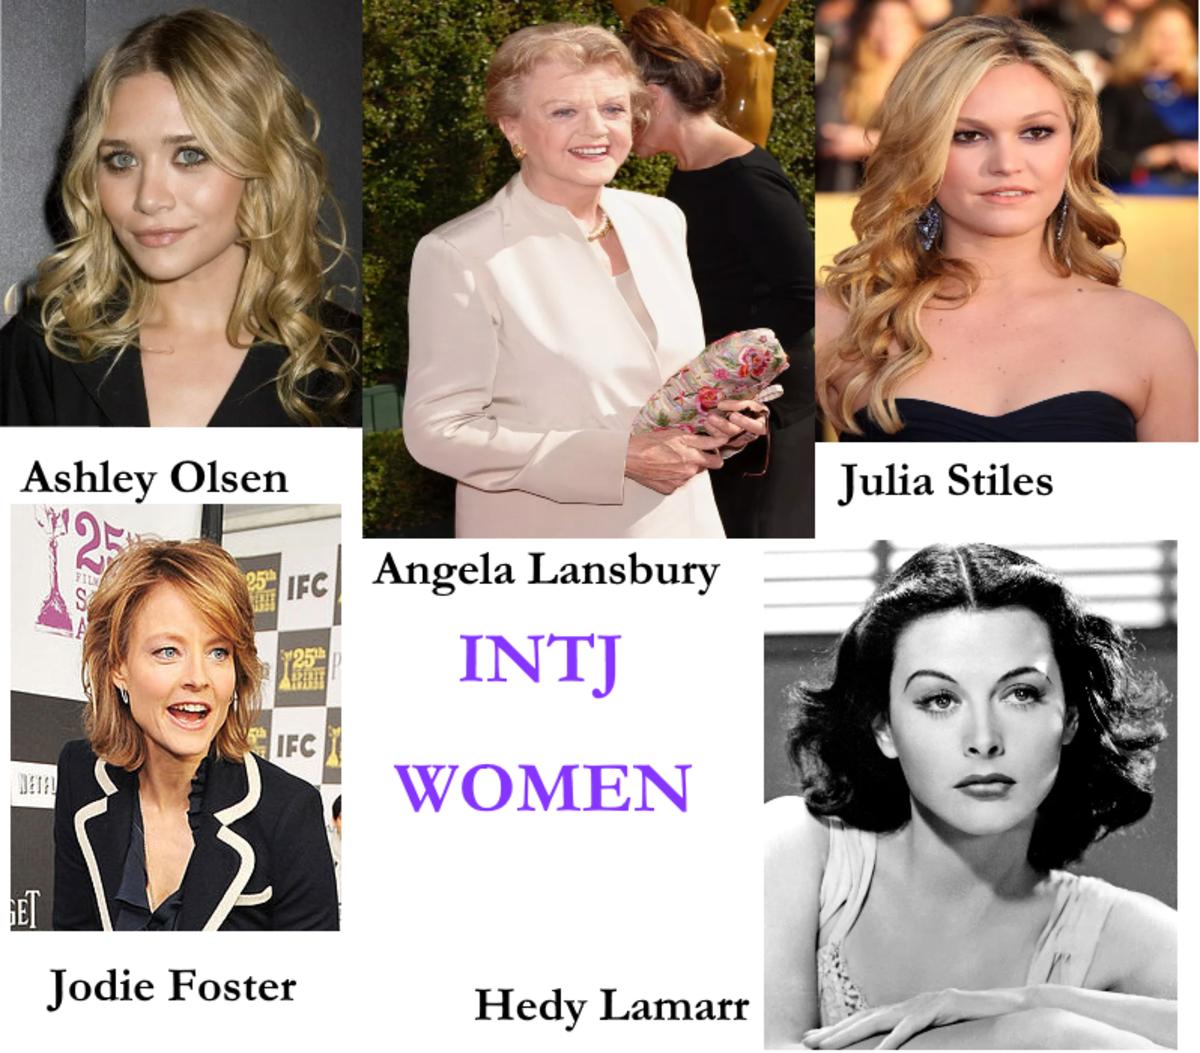 INTJ Women: A Rare Myers-Briggs Category